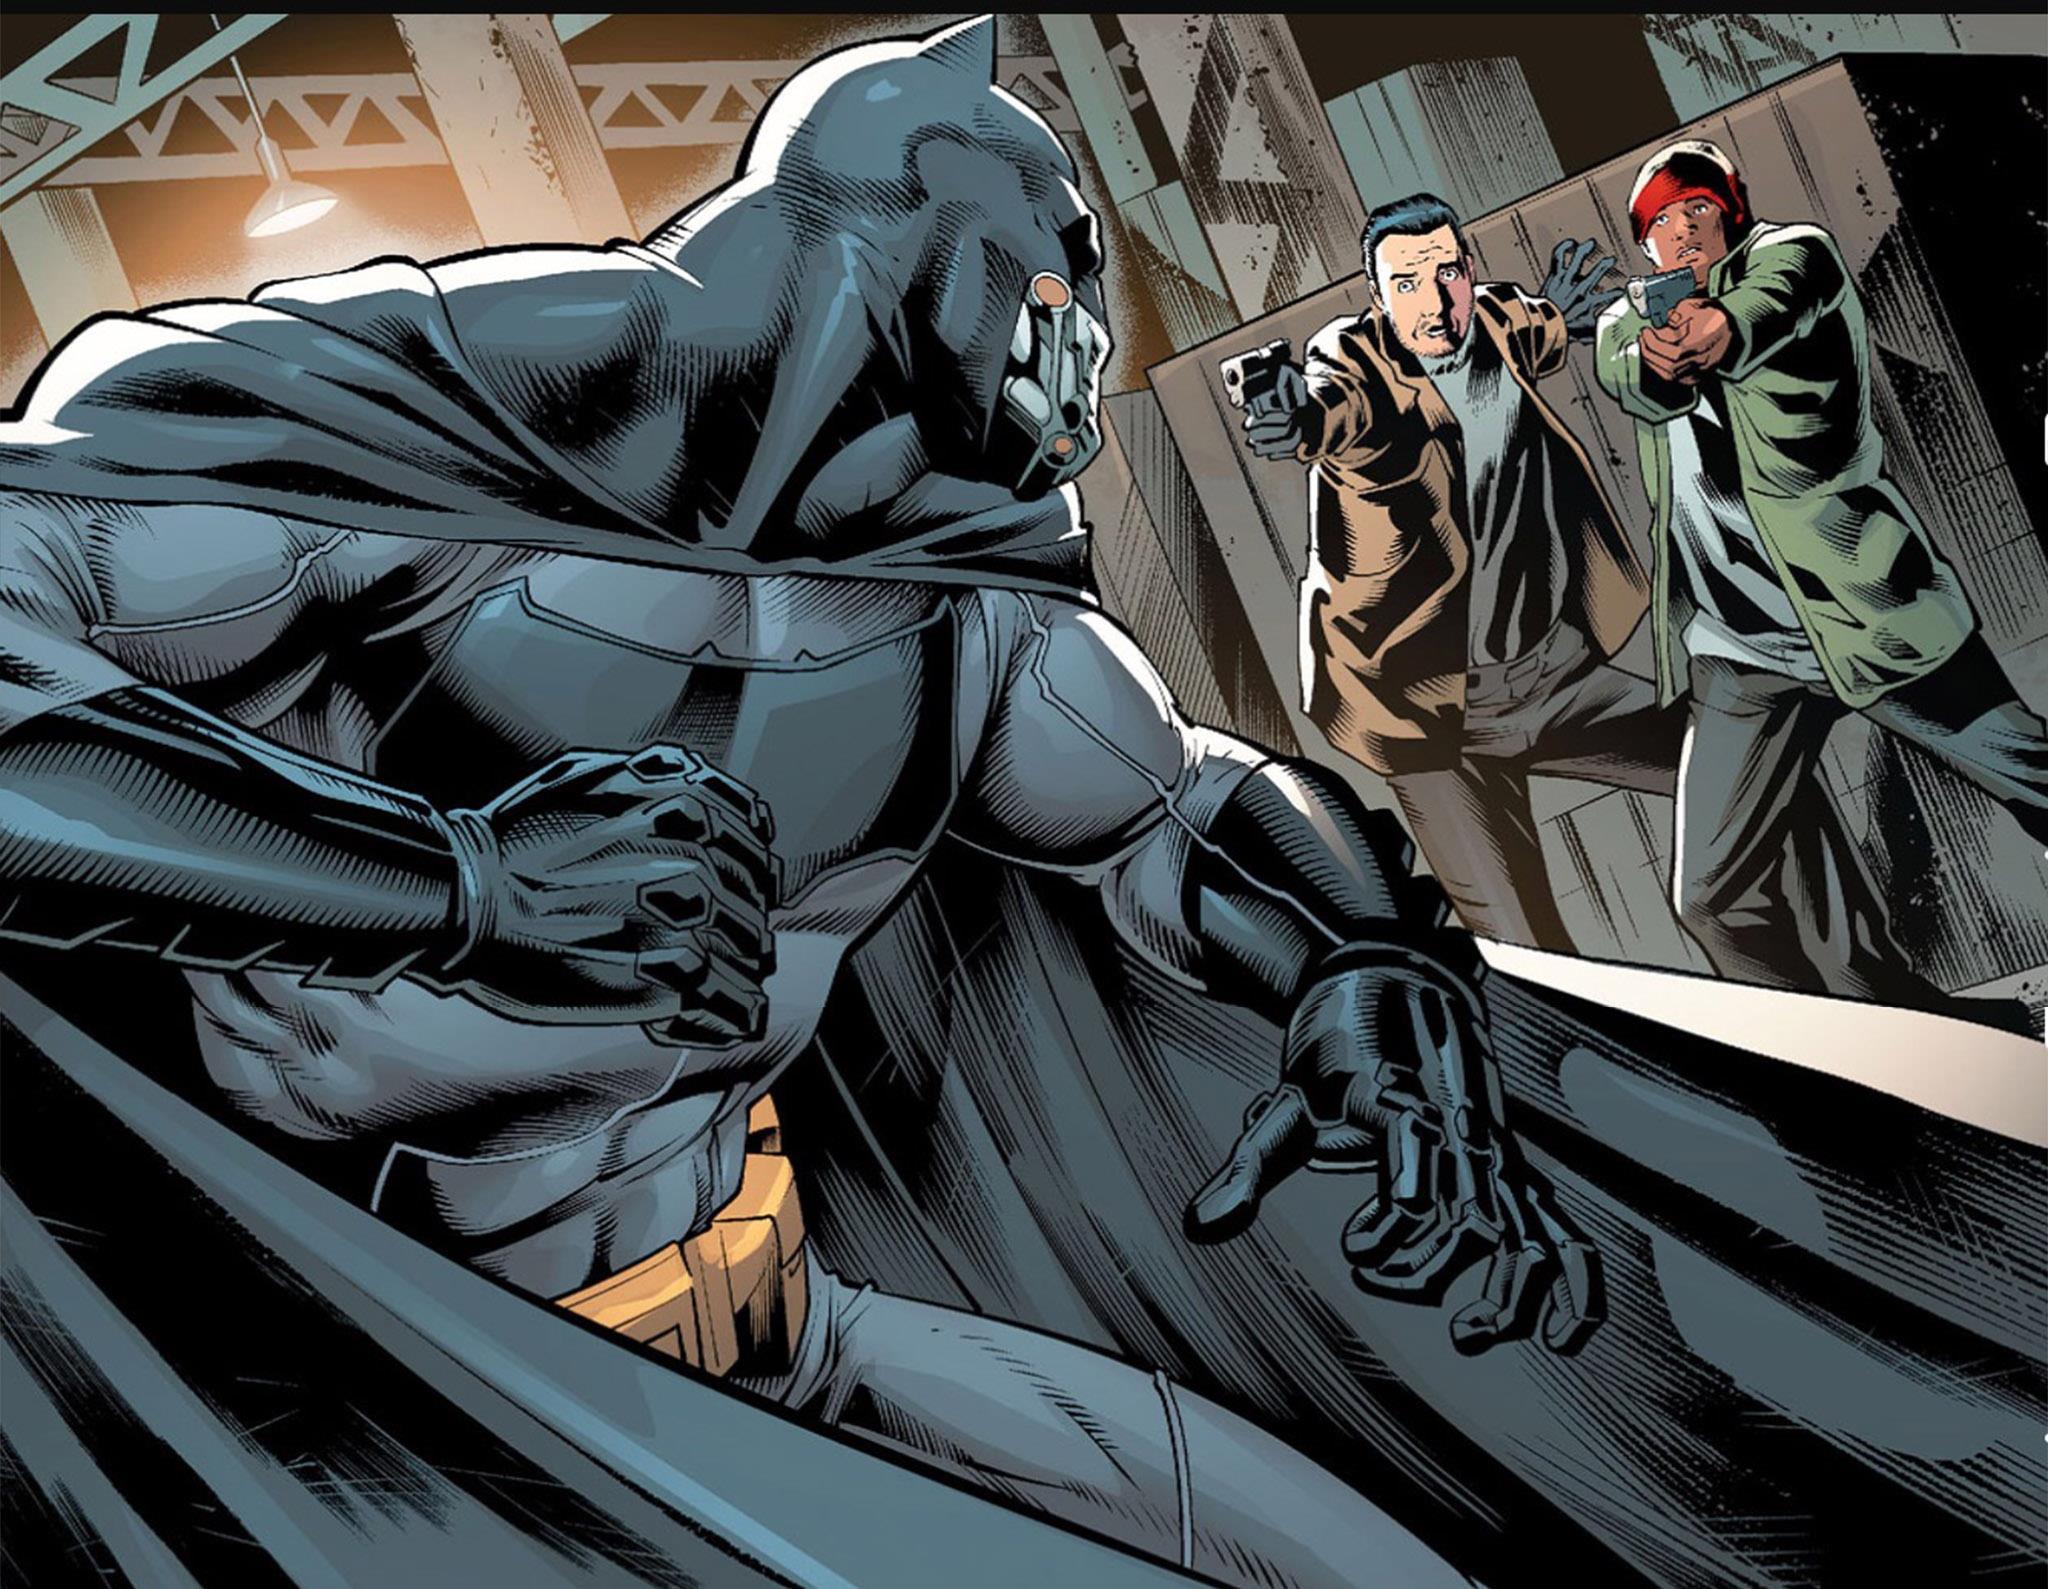 batman_v_superman_dawn_of_justice_chapter_featuring_batman_1_2016_oldal_19.jpg